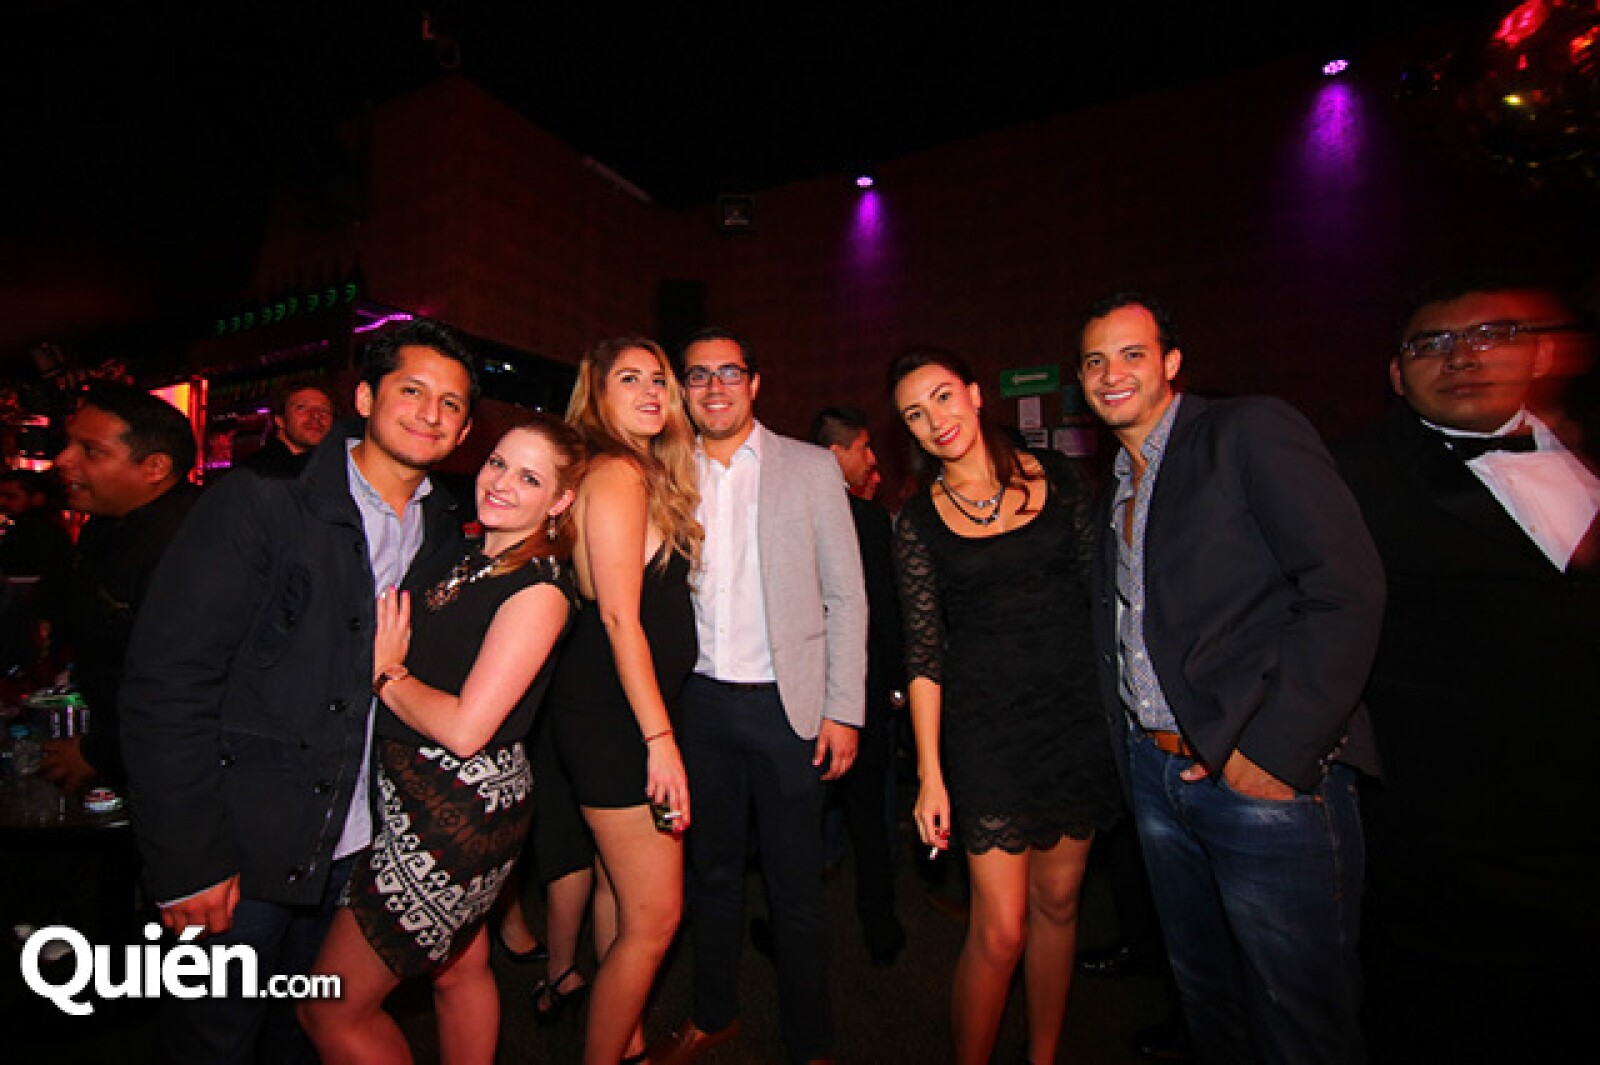 Froylan Hernández,Cecile Boulnois,Karina Rodríguez,Christian Rivera,Ana Castro y Poncho Hinojosa